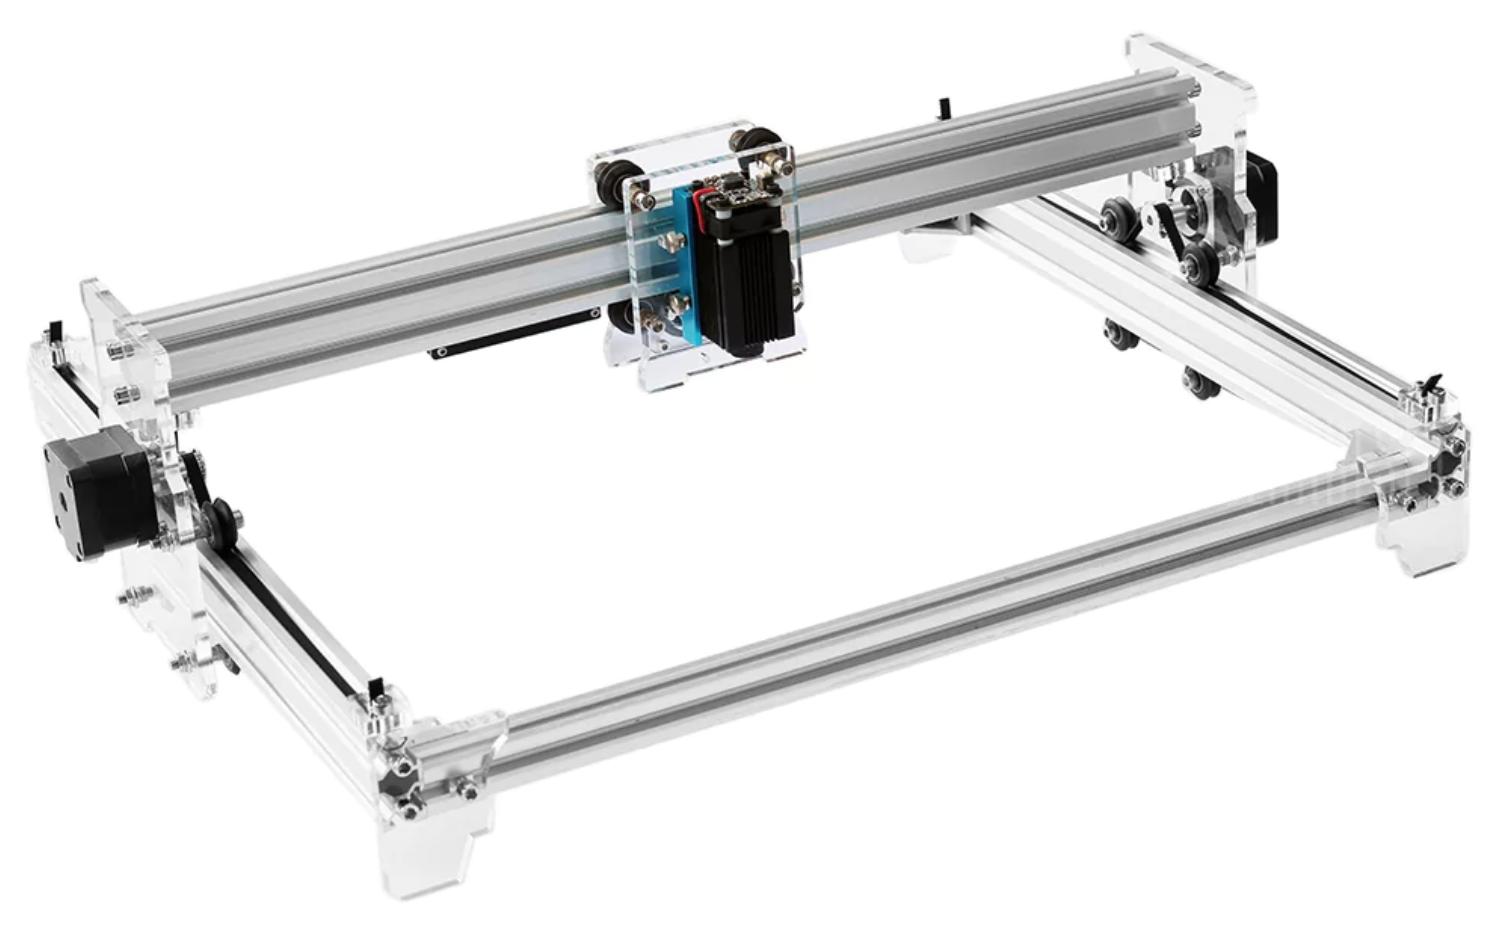 Eleksmaker A3 Pro 2500mw Laser Engraver Pevly Reviews